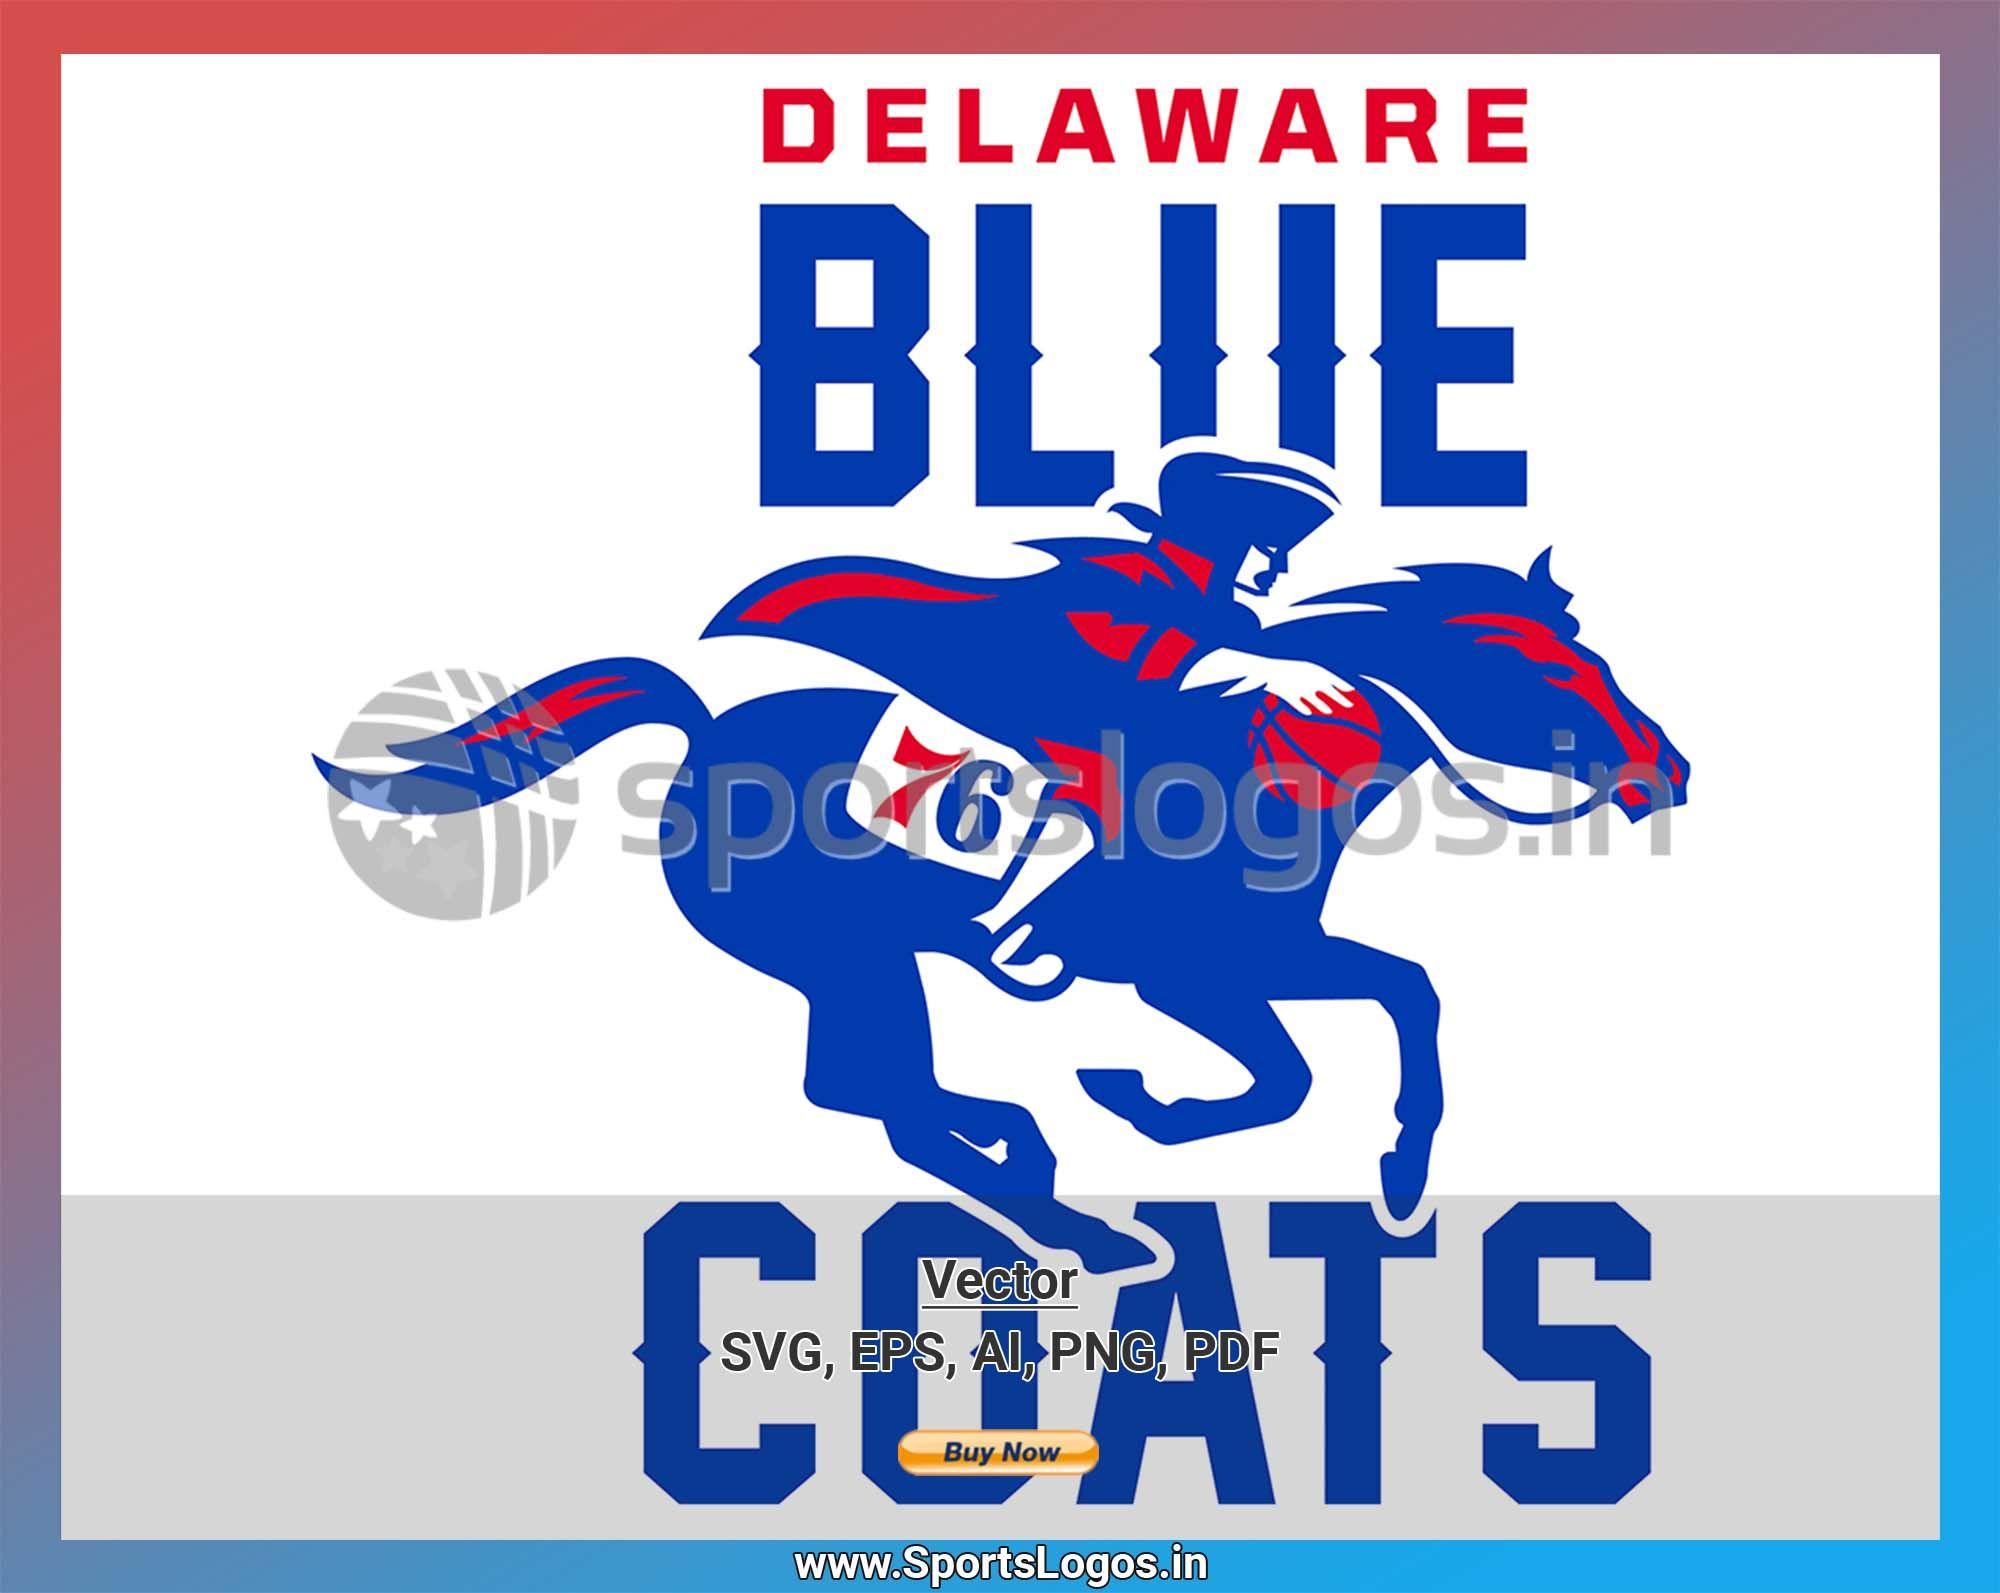 Delaware Blue Coats 2018/19, NBA Gatorade League